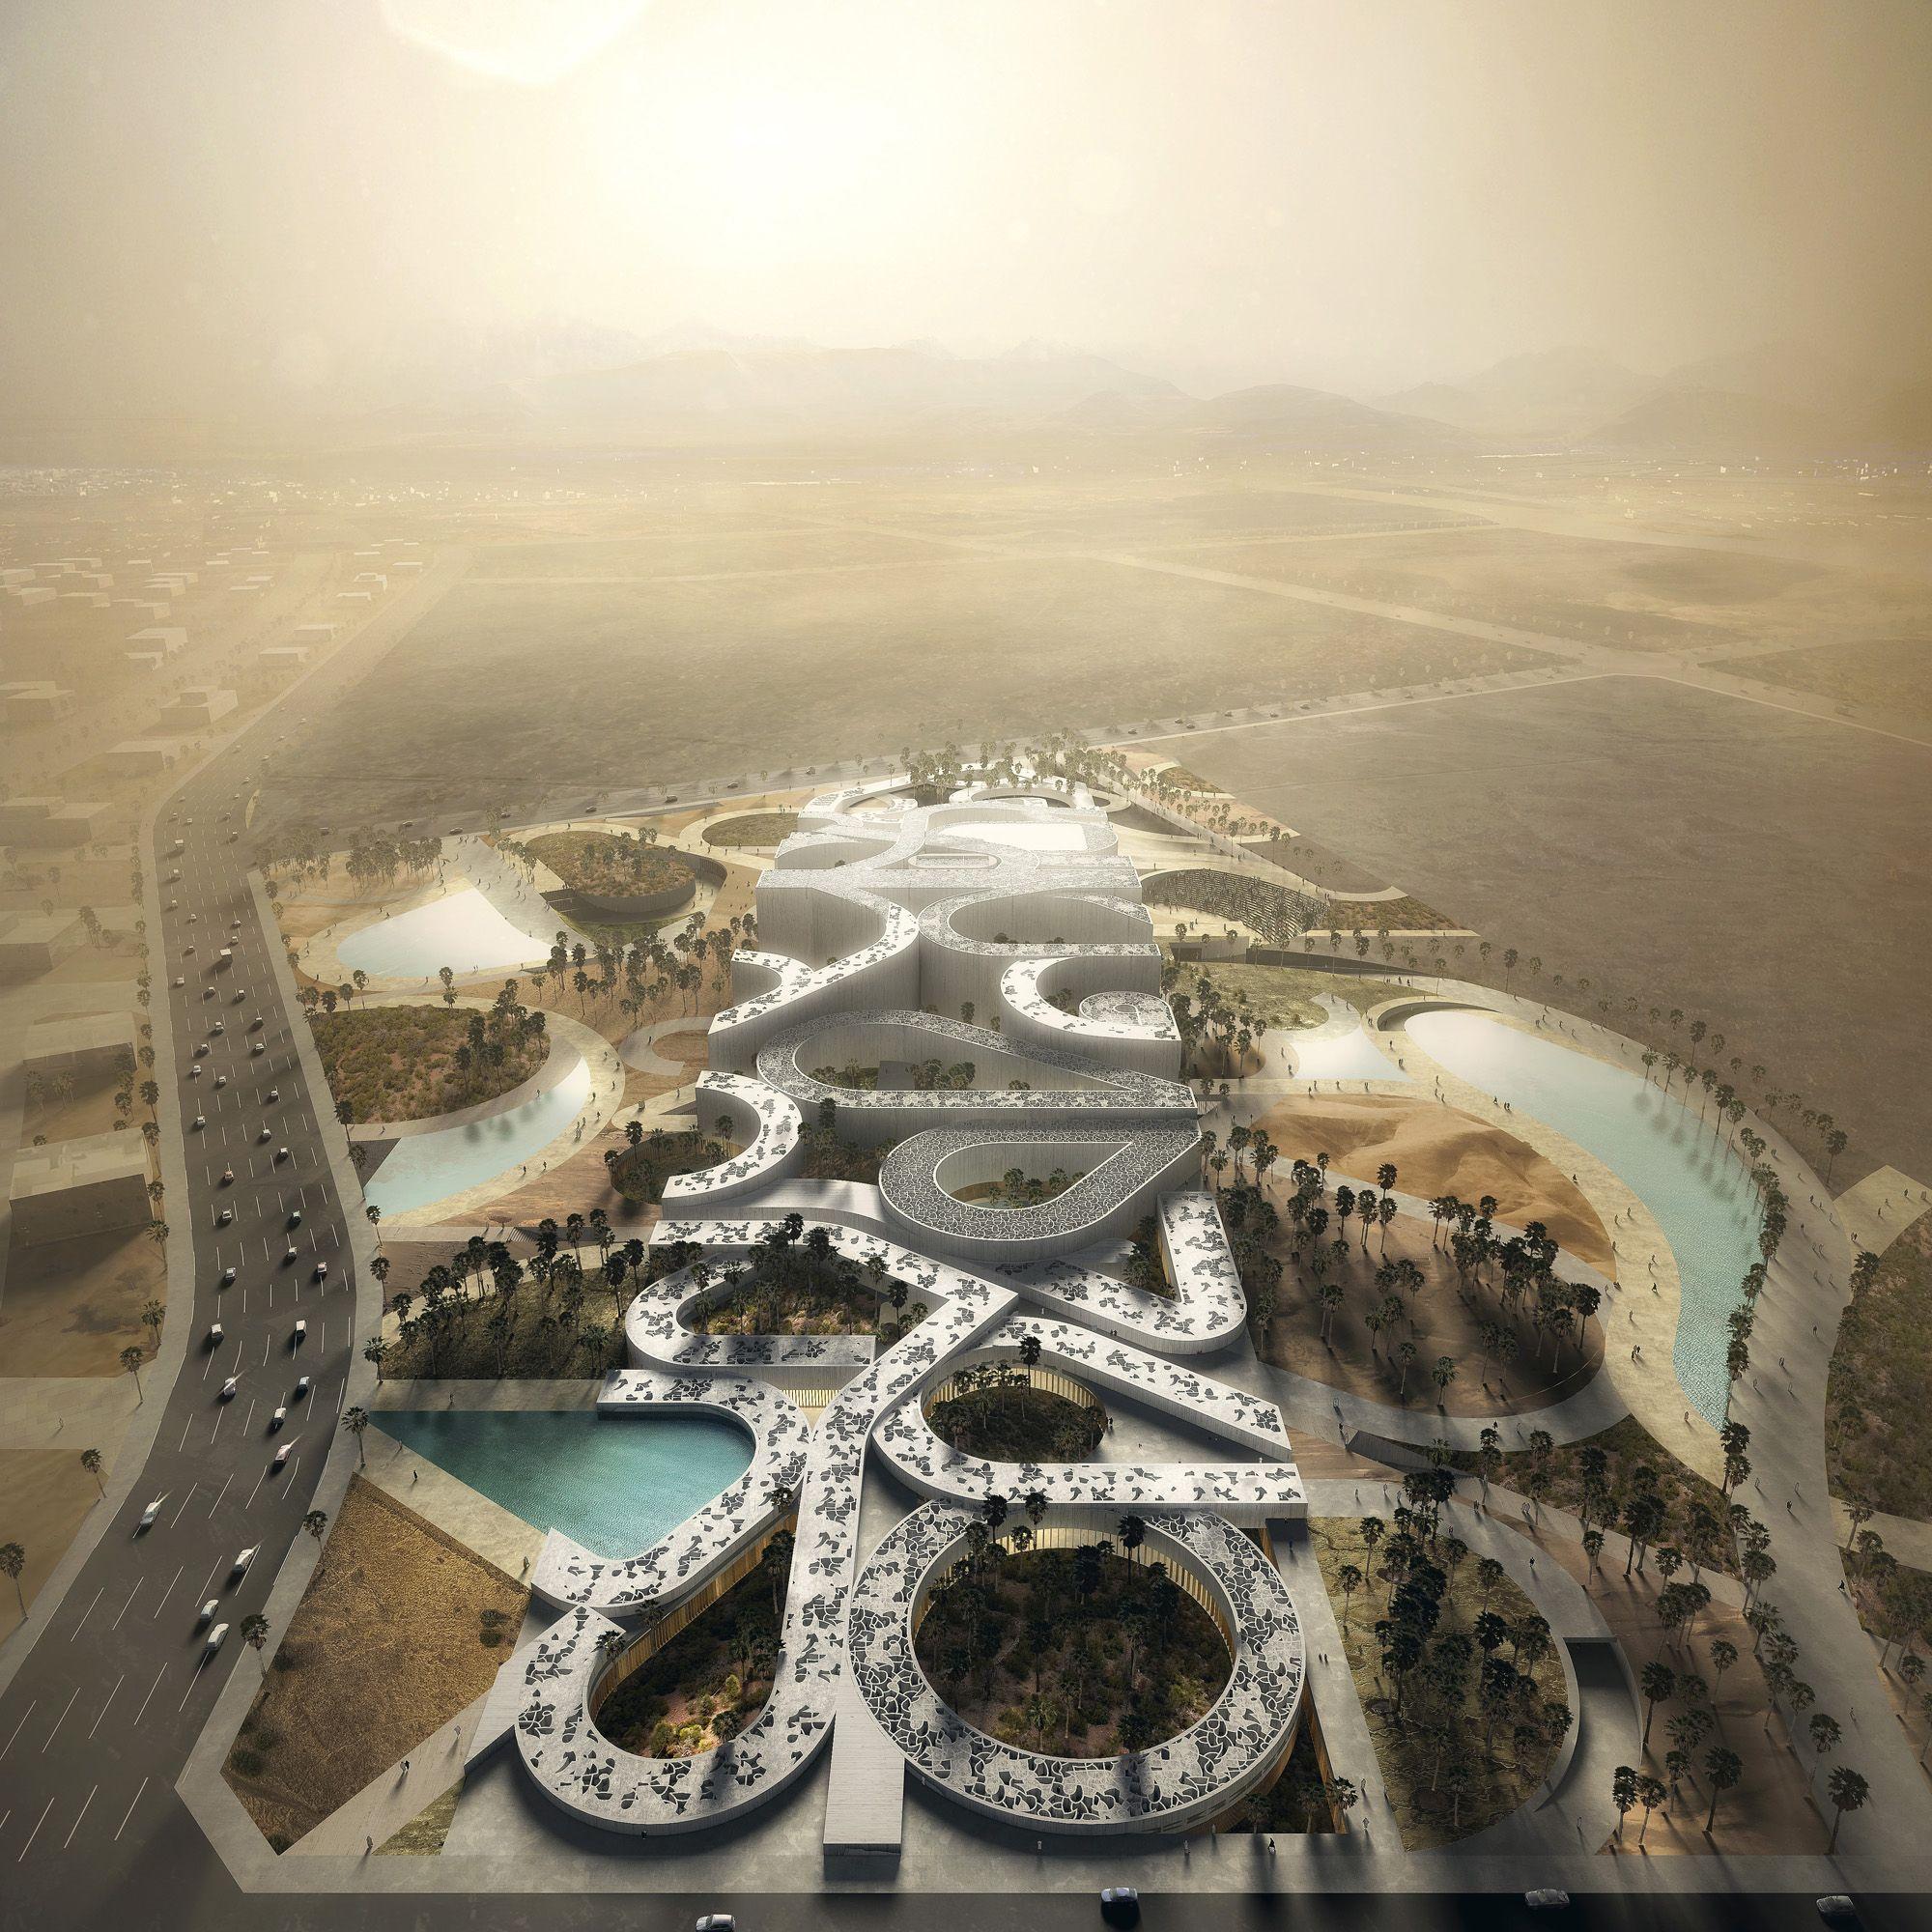 Noble Quran Oasis Habilitaciones Urbanas Arquitectura Contemporanea Urbano